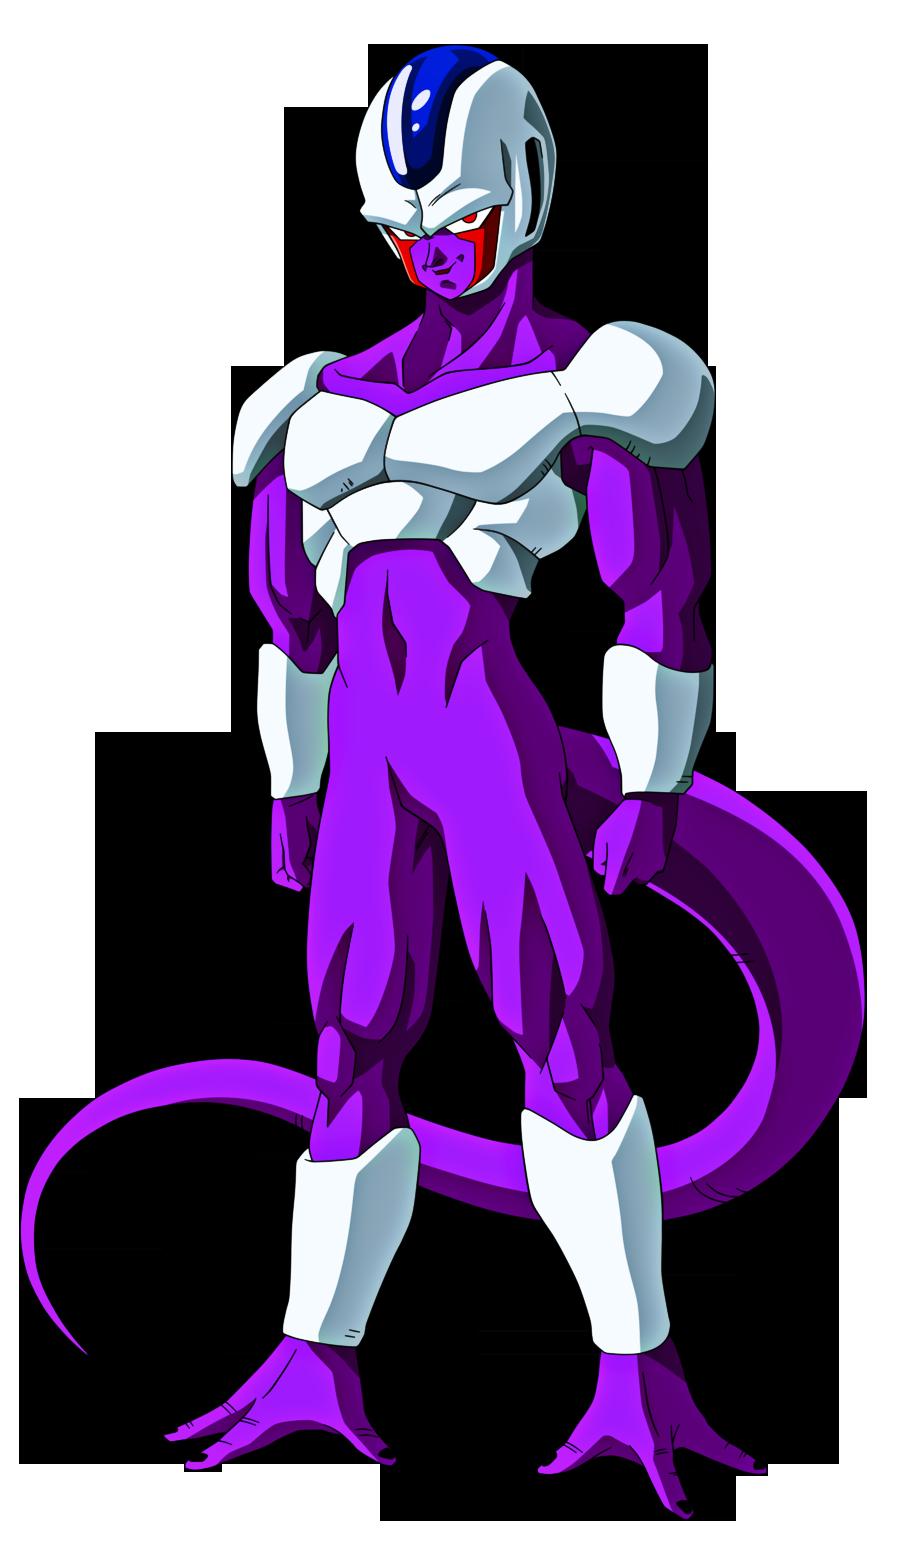 Dbz Cooler Personajes De Dragon Ball Dragones Personajes De Goku